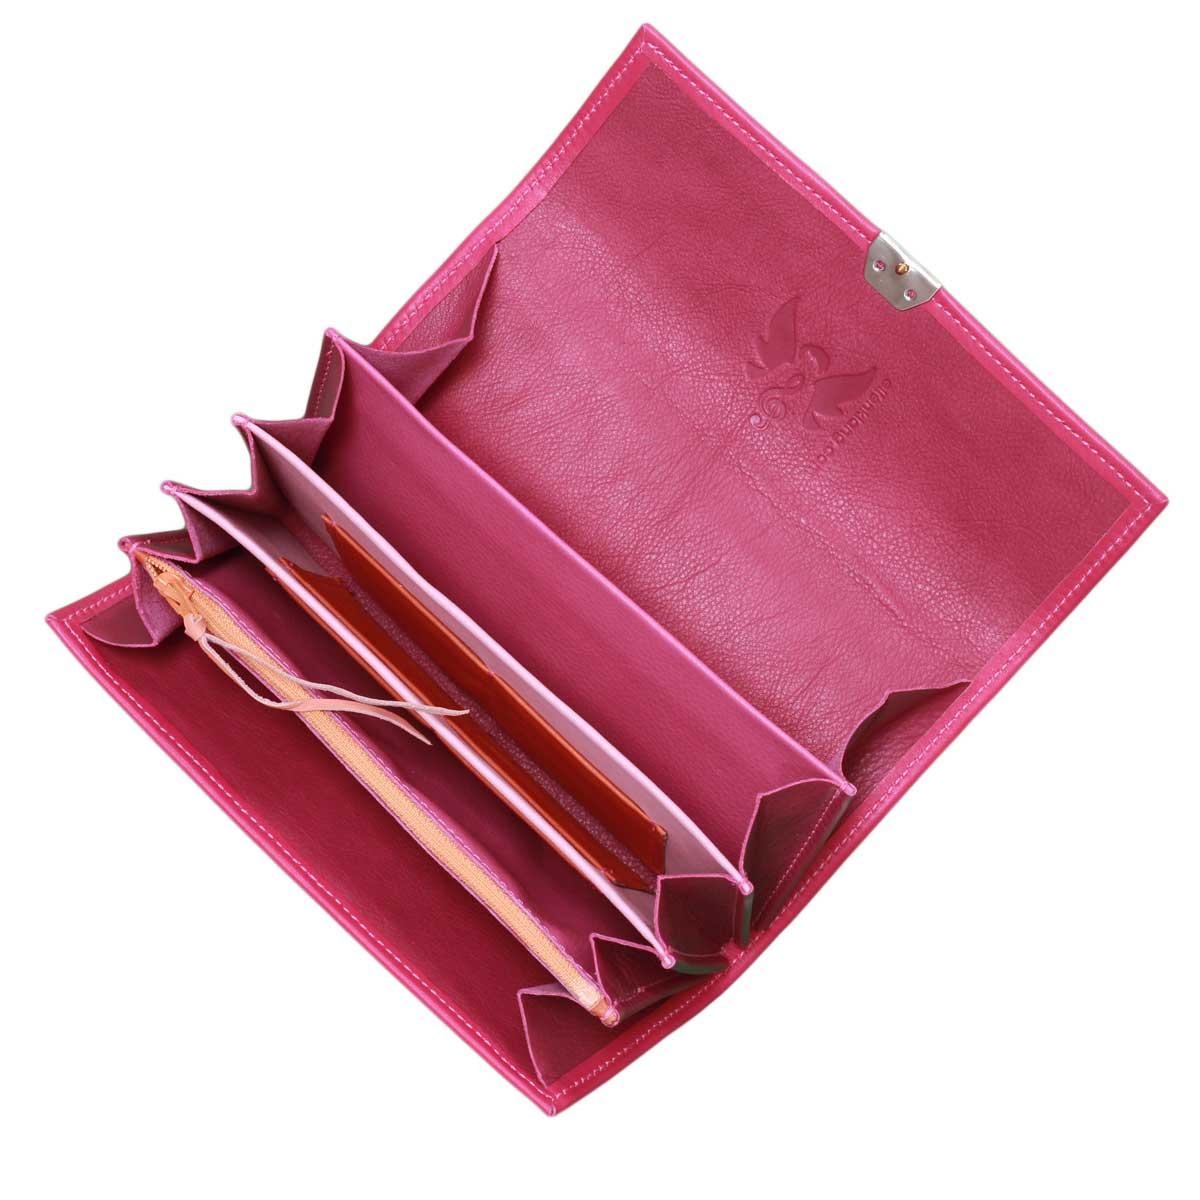 Extra Grosse Geldb 246 Rse Leder Pink Xl Elfenklang Geldb 246 Rsen